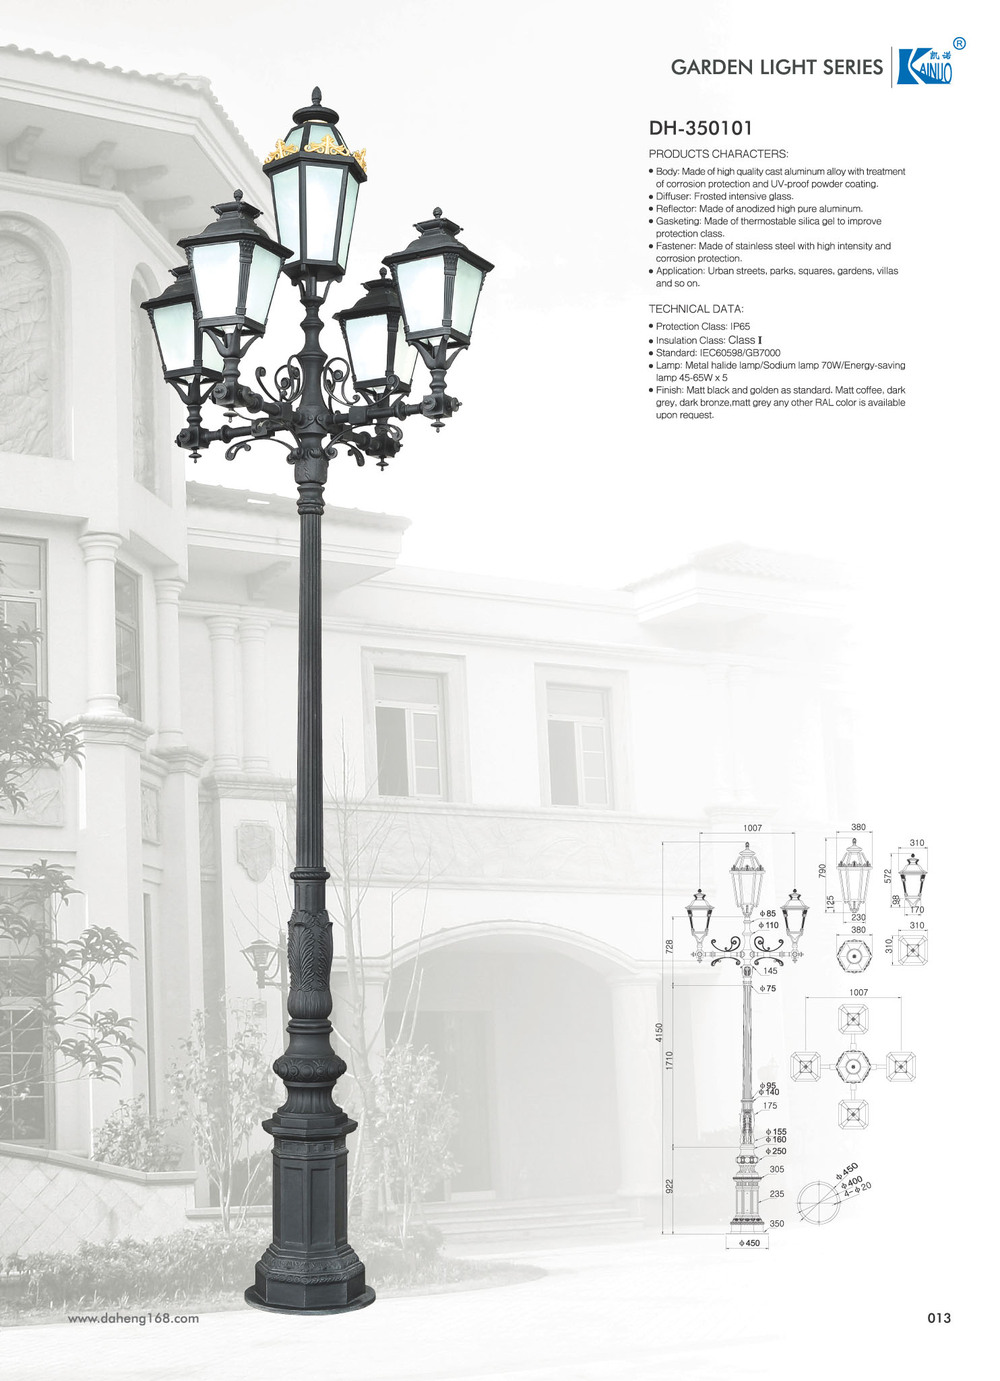 Classic Aluminum Garden Light Pole